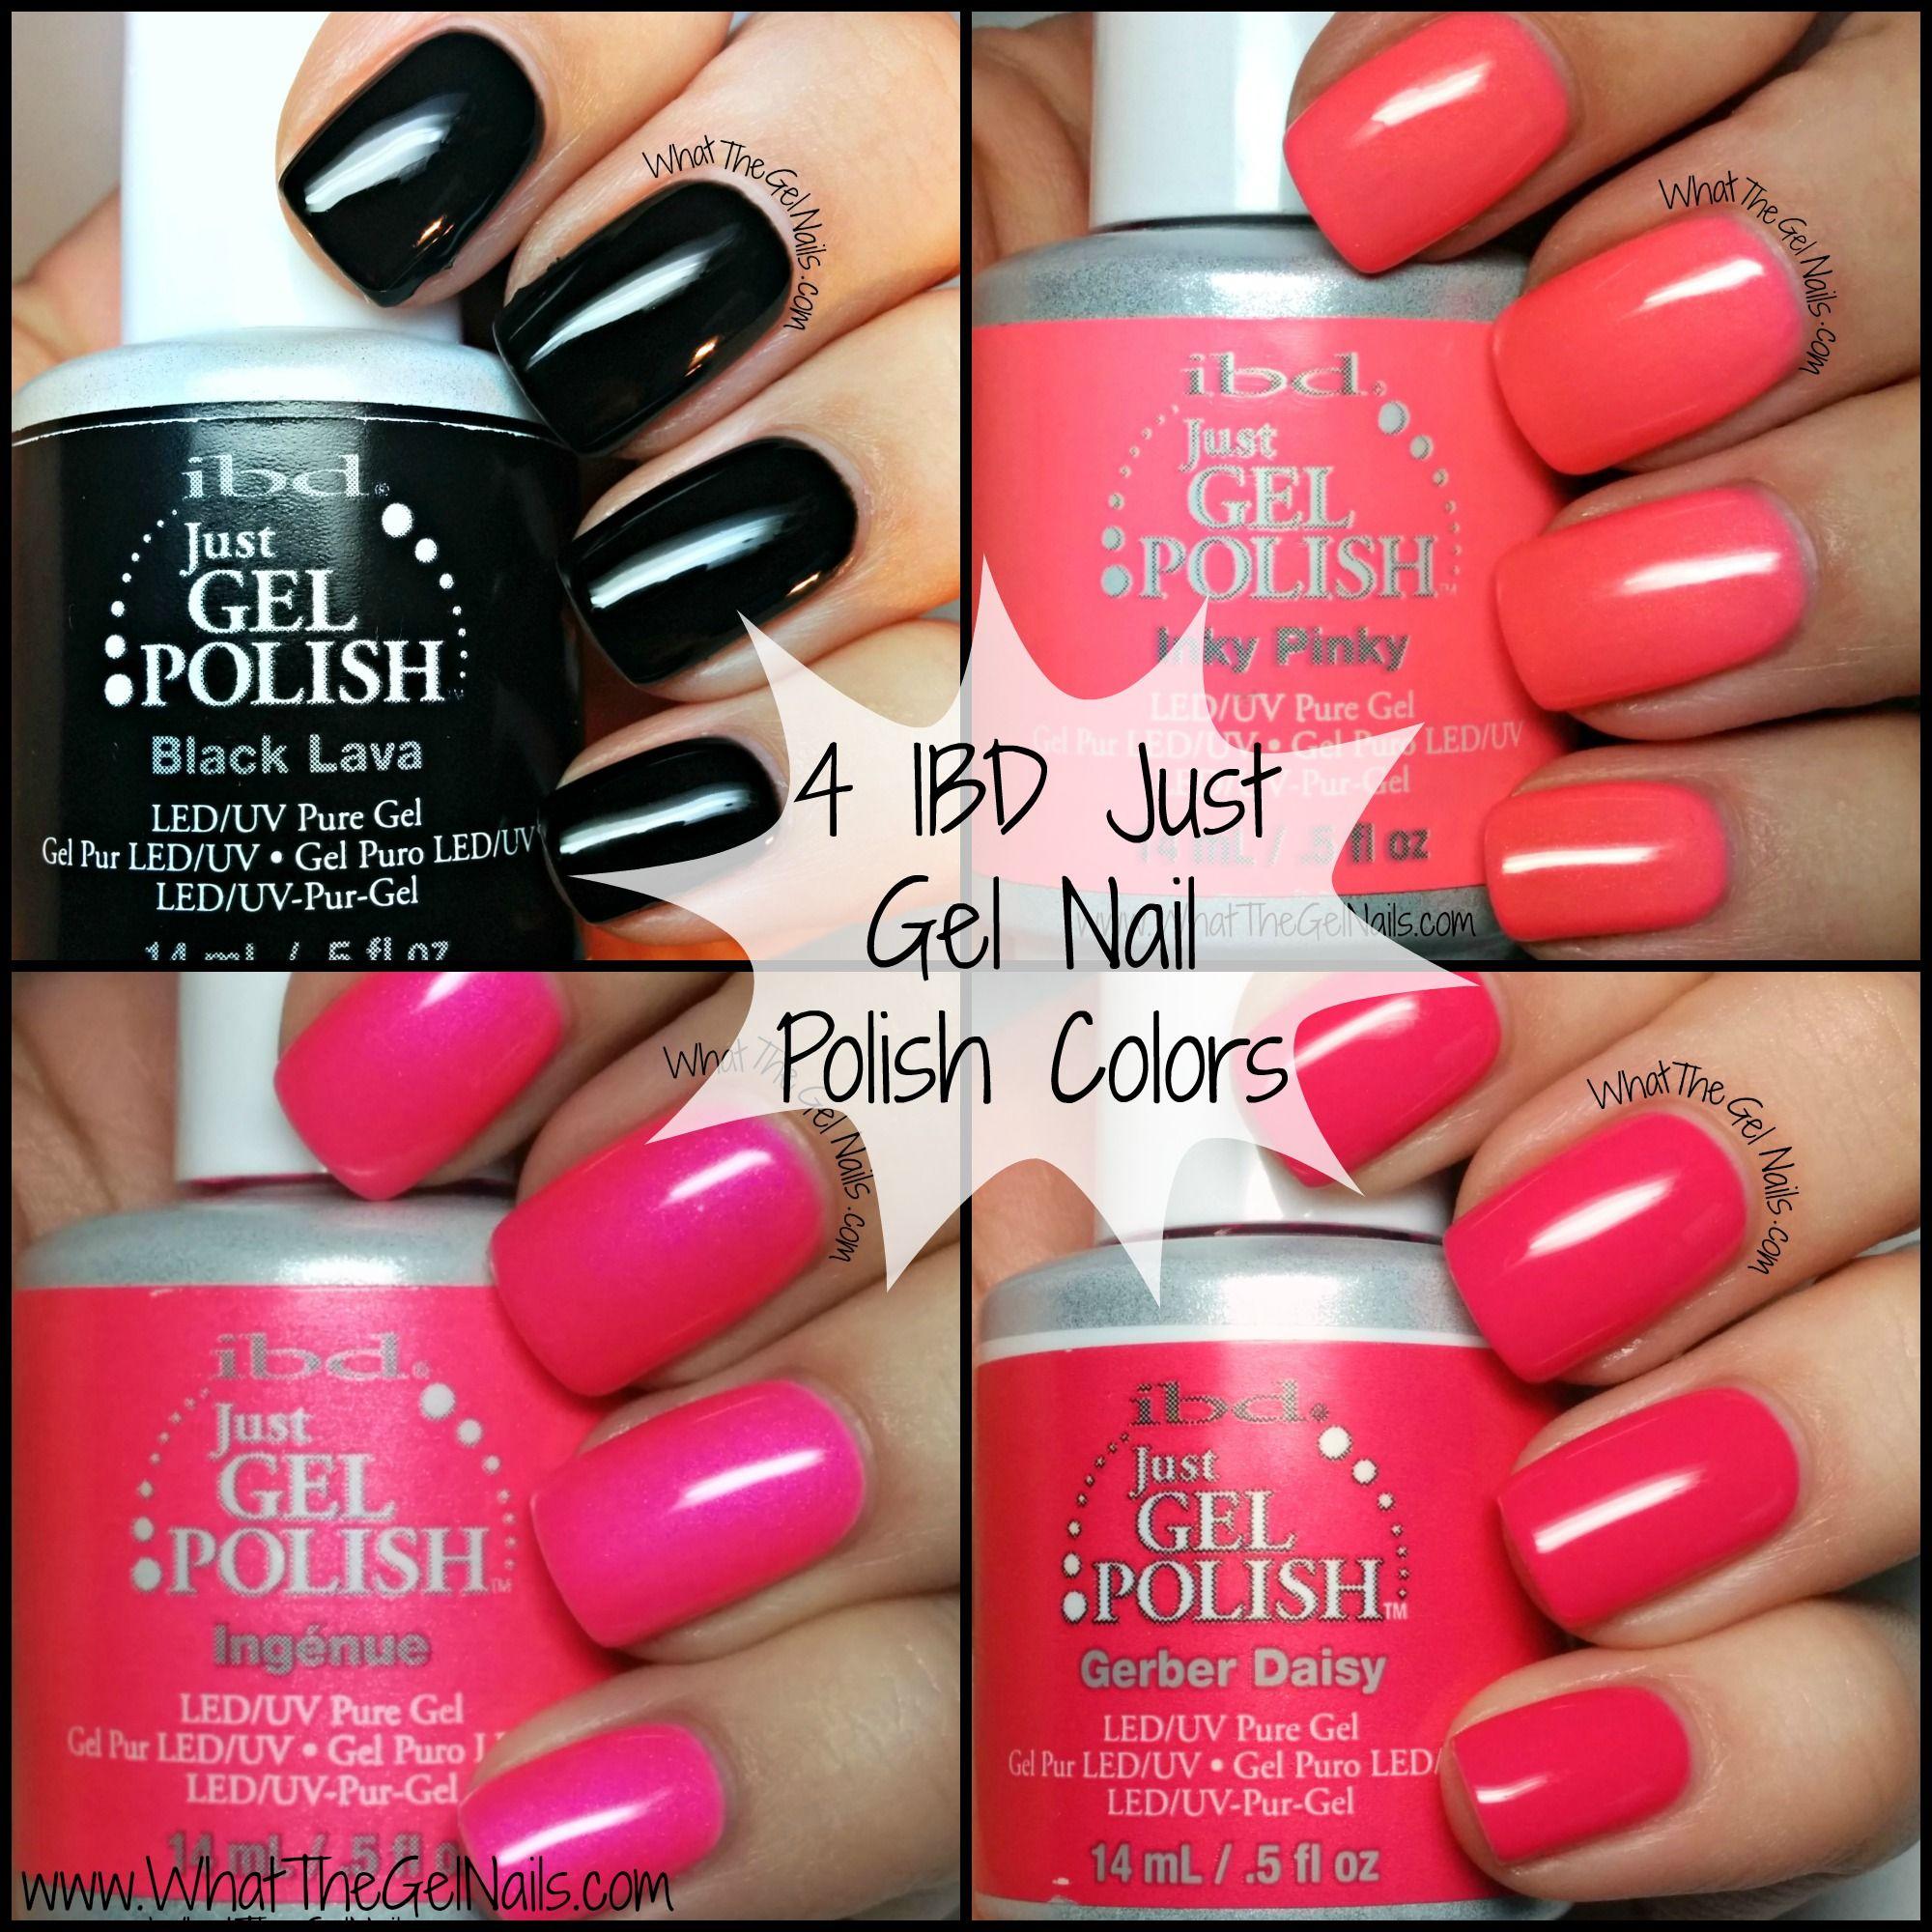 Black Gel Nail Polish: Swatches For 4 IBD Just Gel Nail Polish Colors. IBD Black